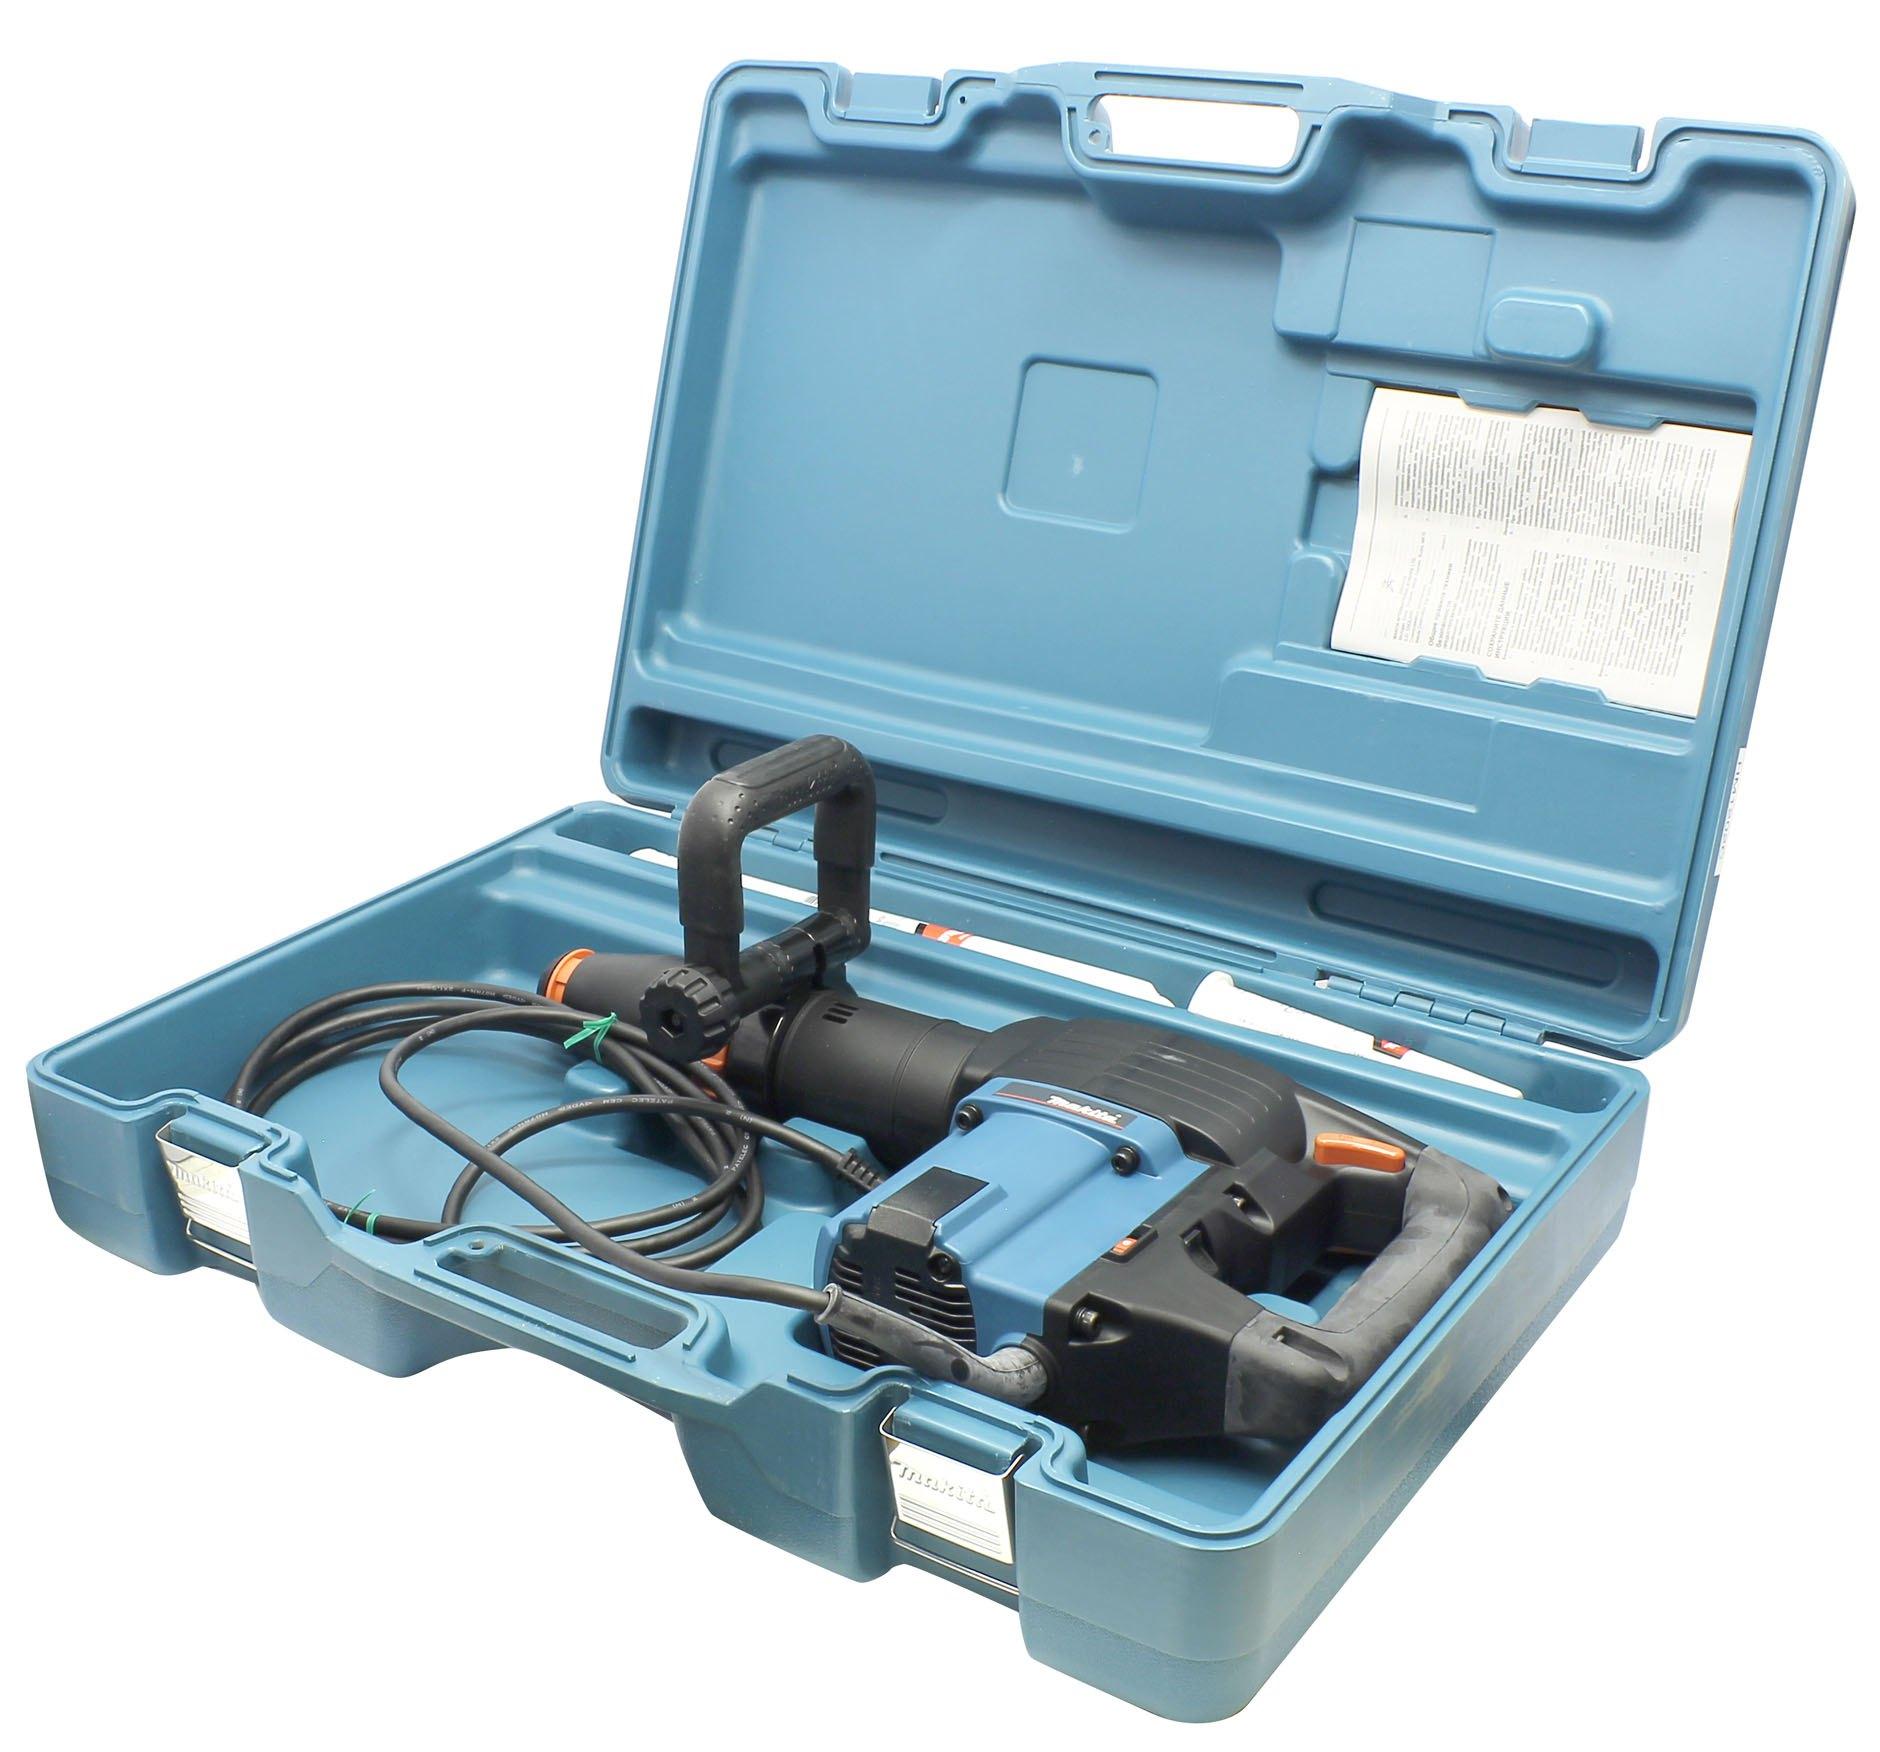 Makita HM1202C Отбойный молоток (1450 Вт, 21.9 Дж, 1900 уд/мин, SDS-Max, регулятор, кейс)